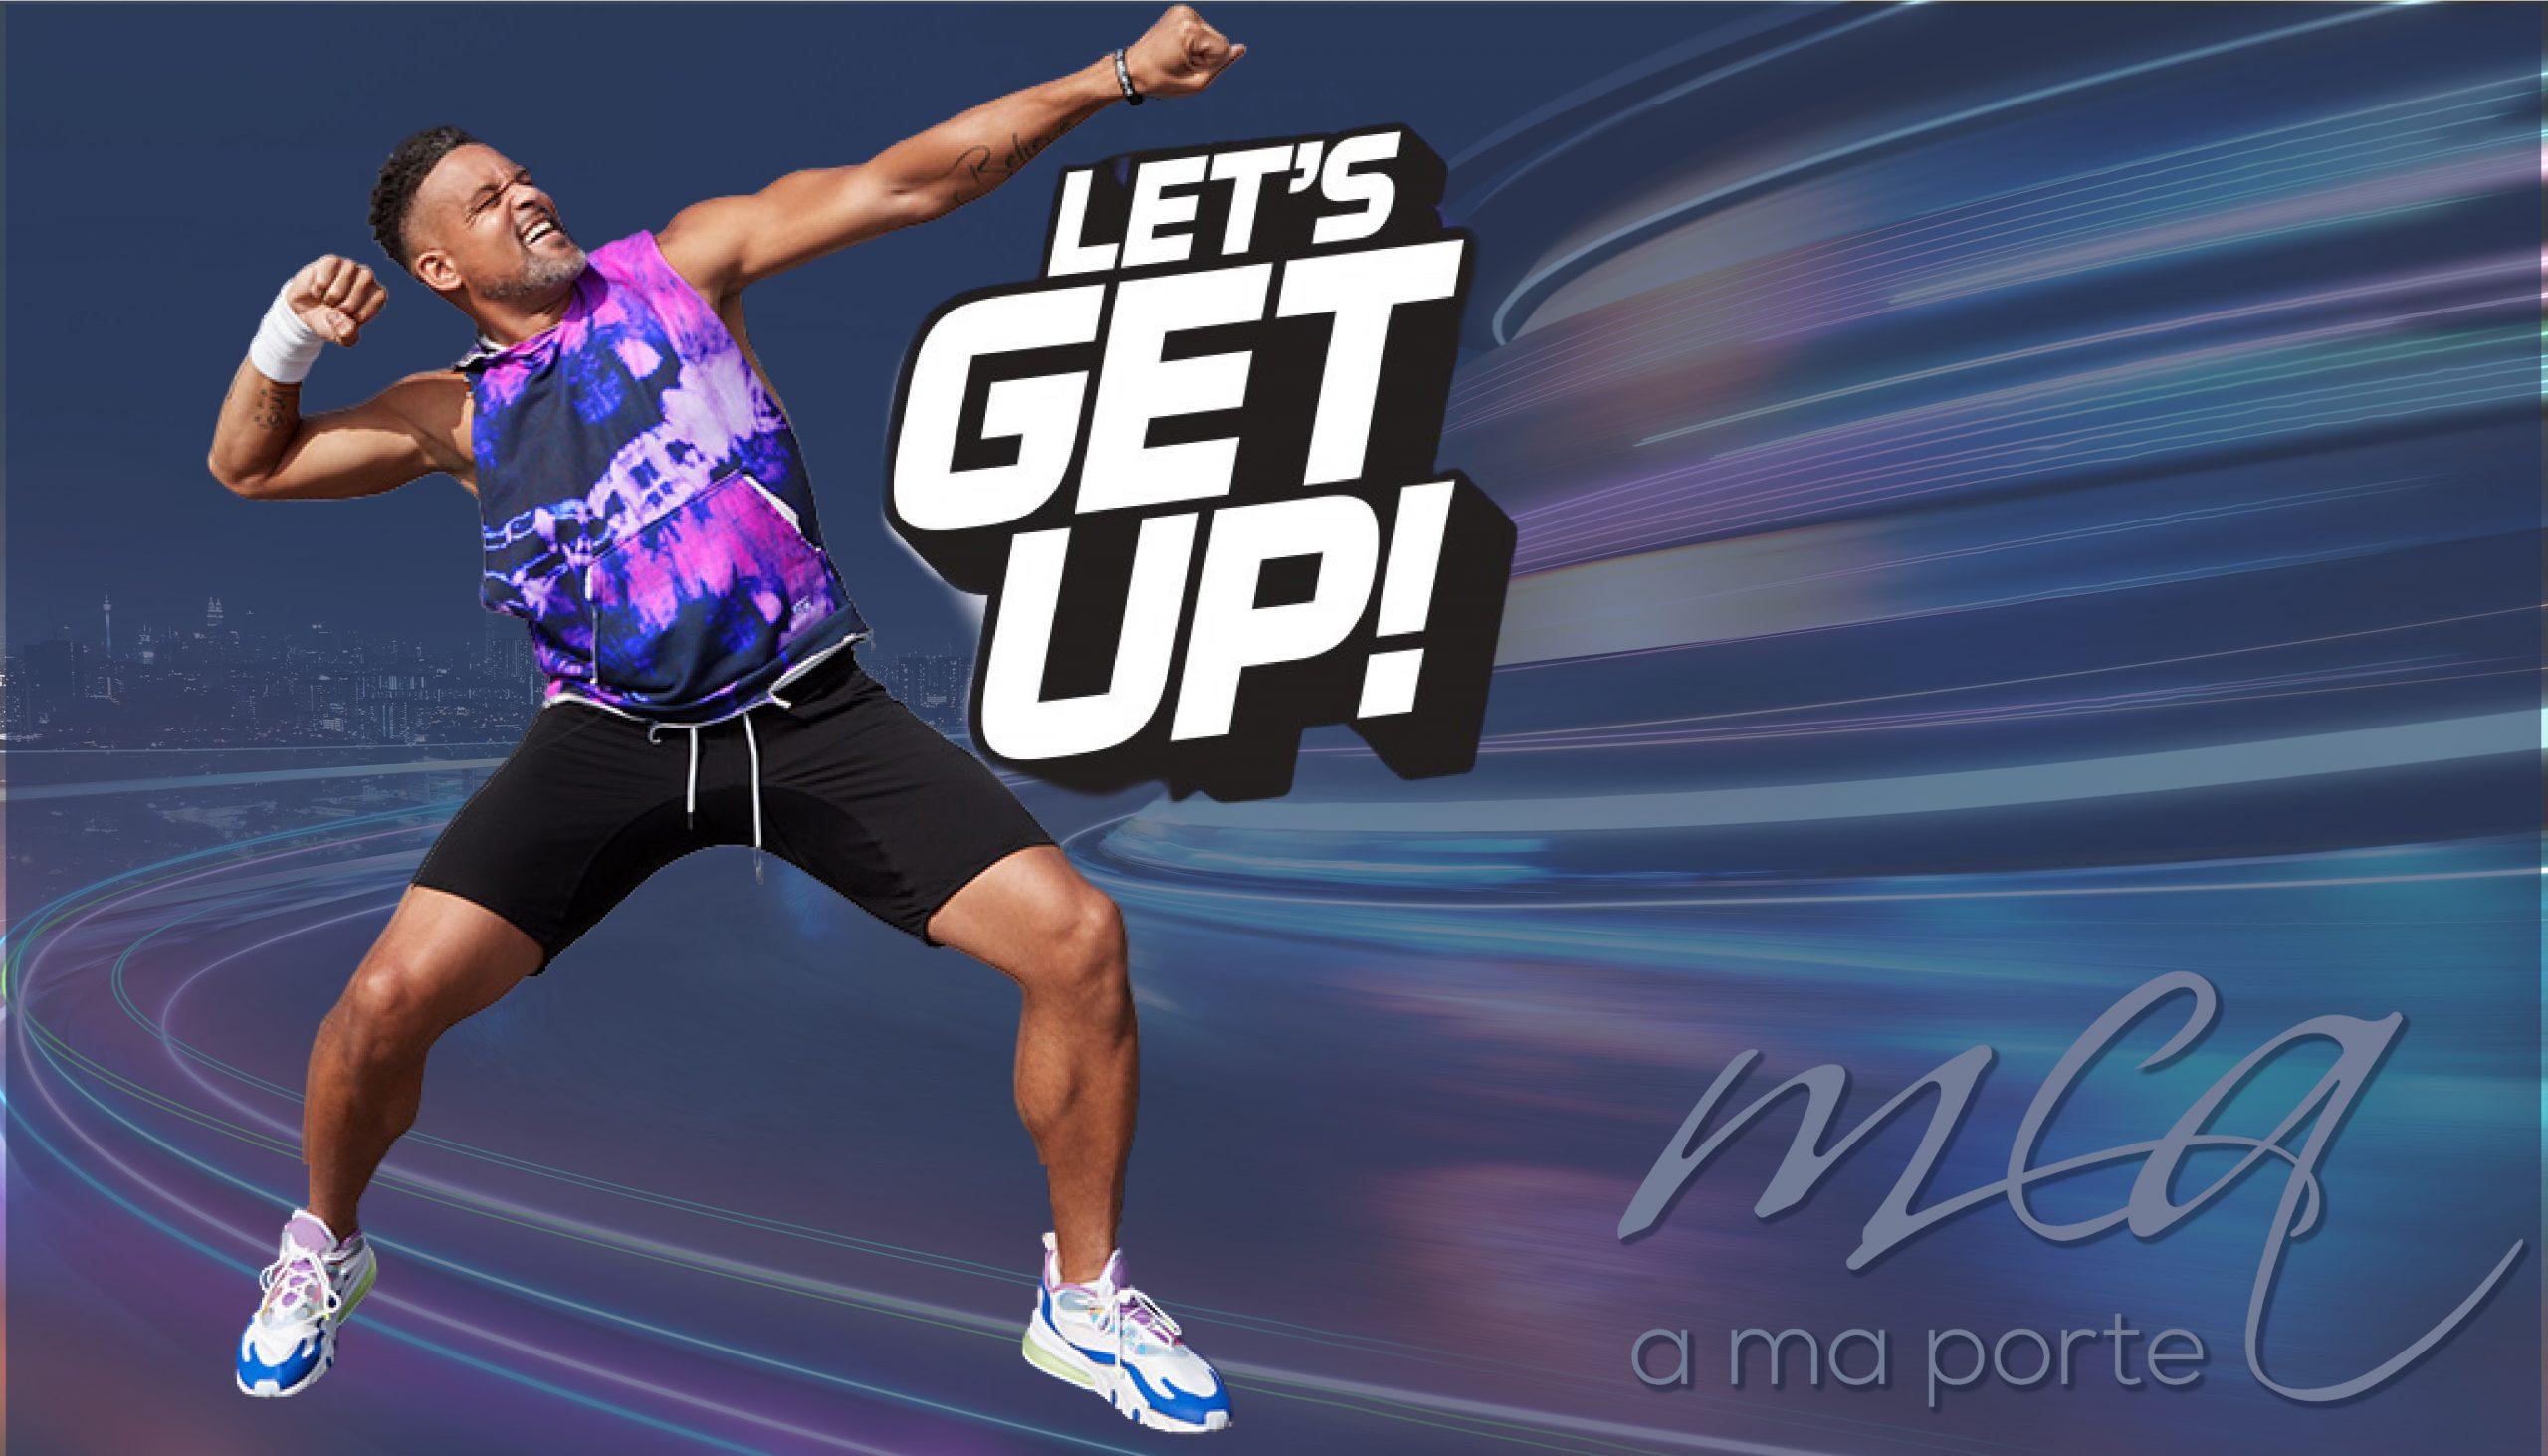 Let's Get Up